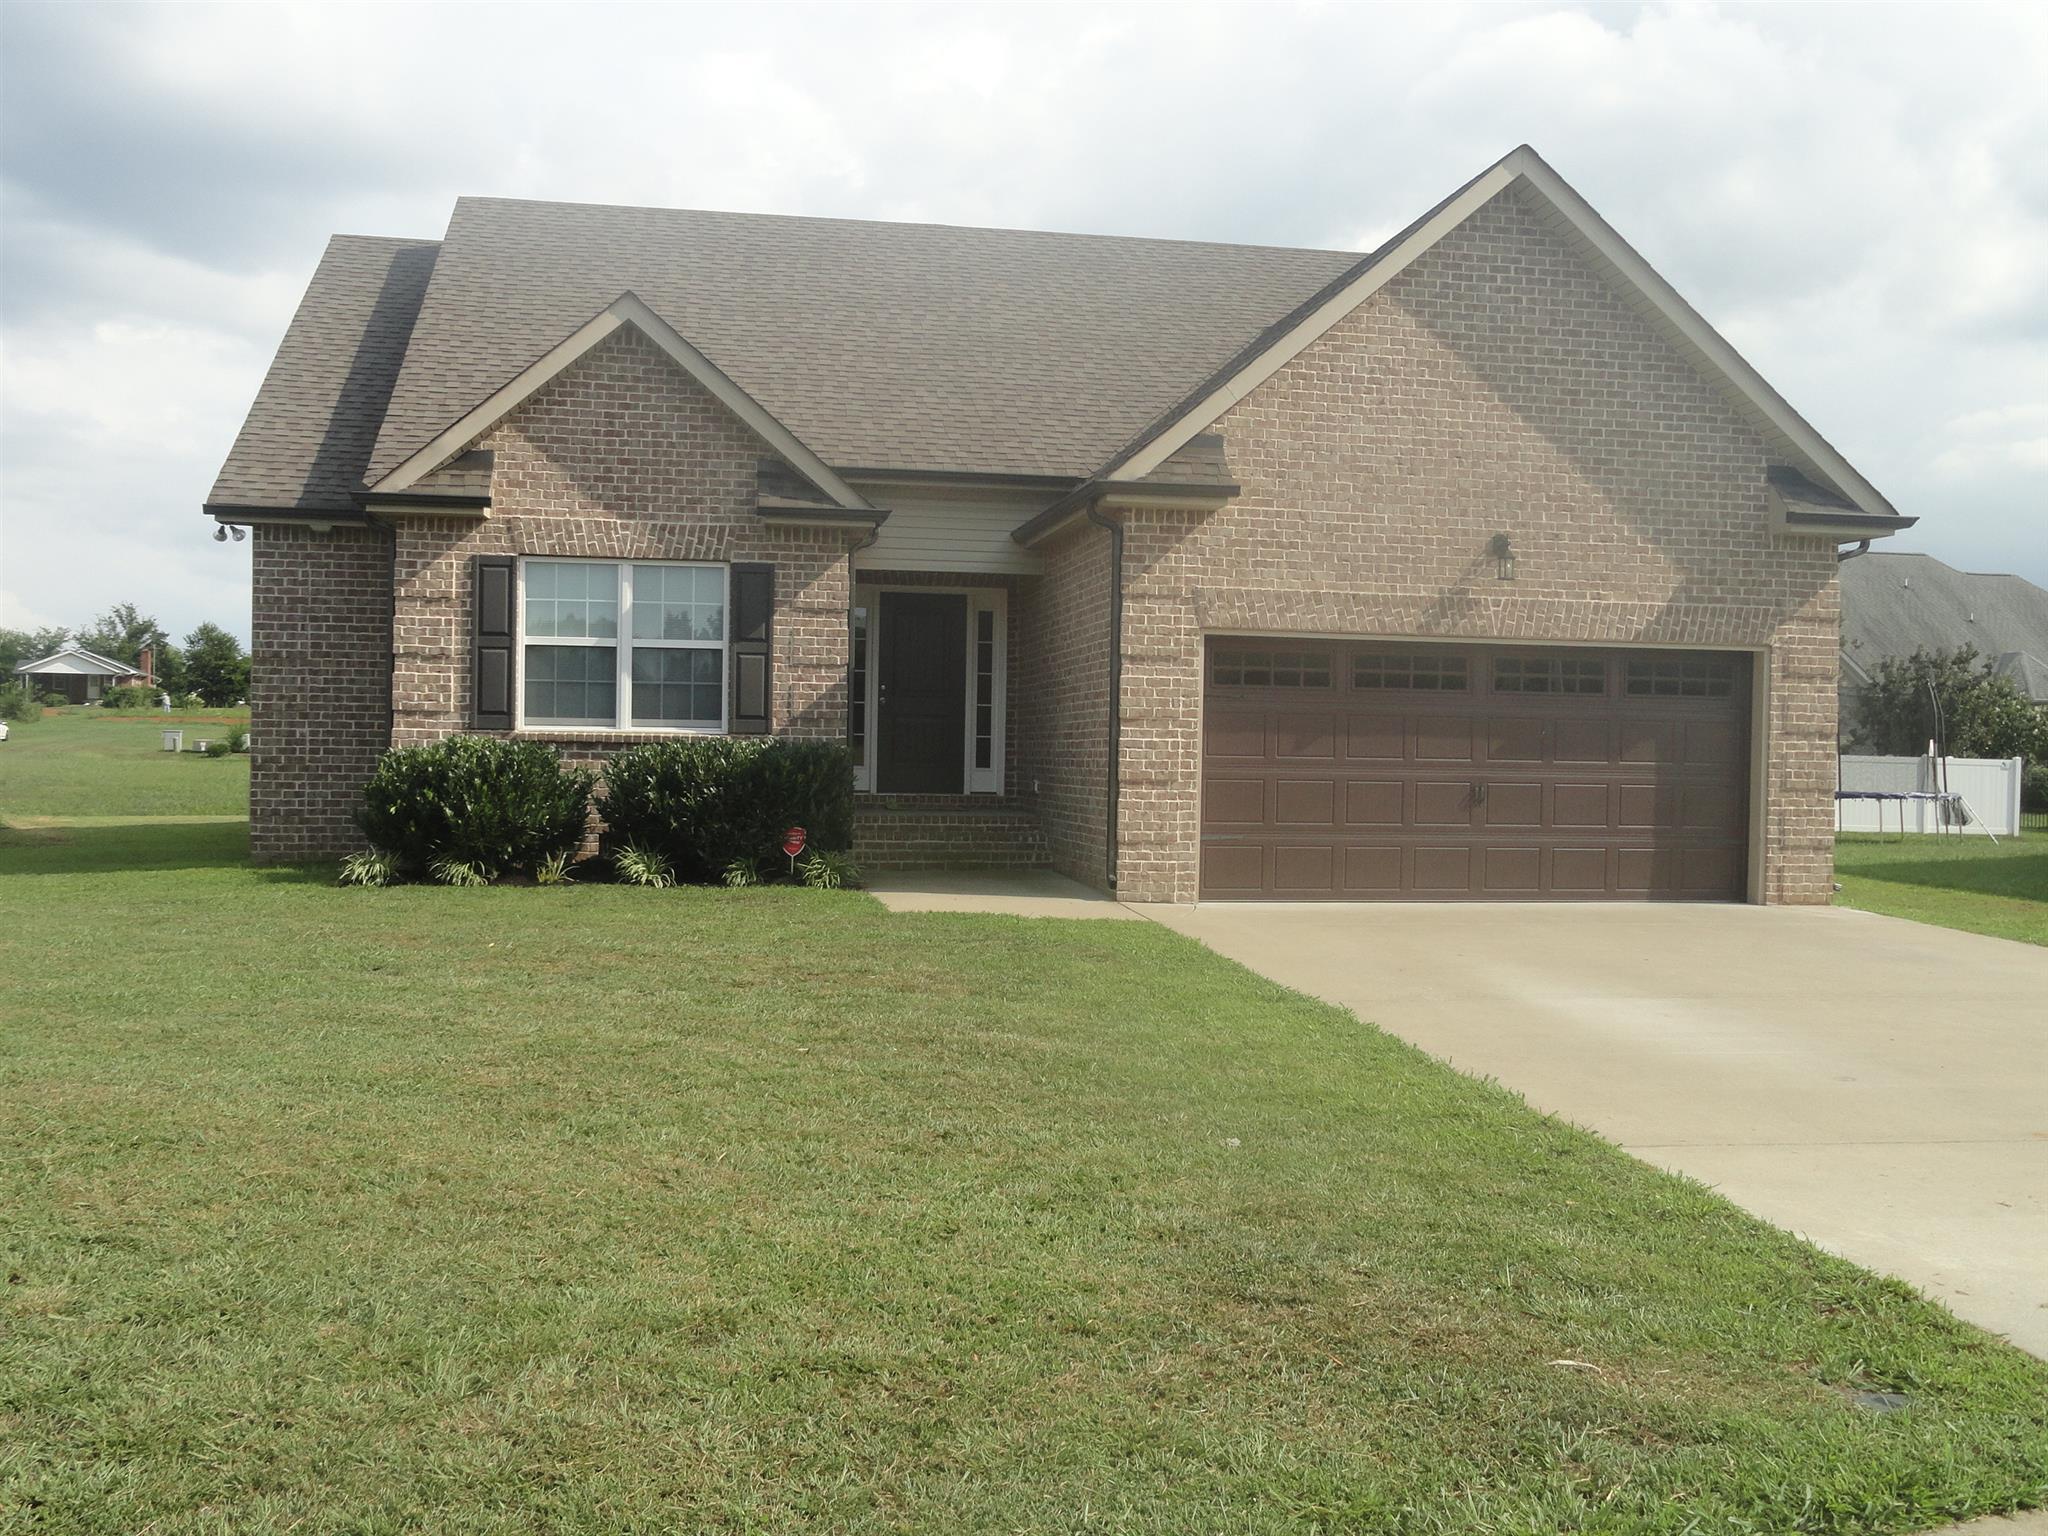 2344 Foxworth Ct, Murfreesboro, TN 37127